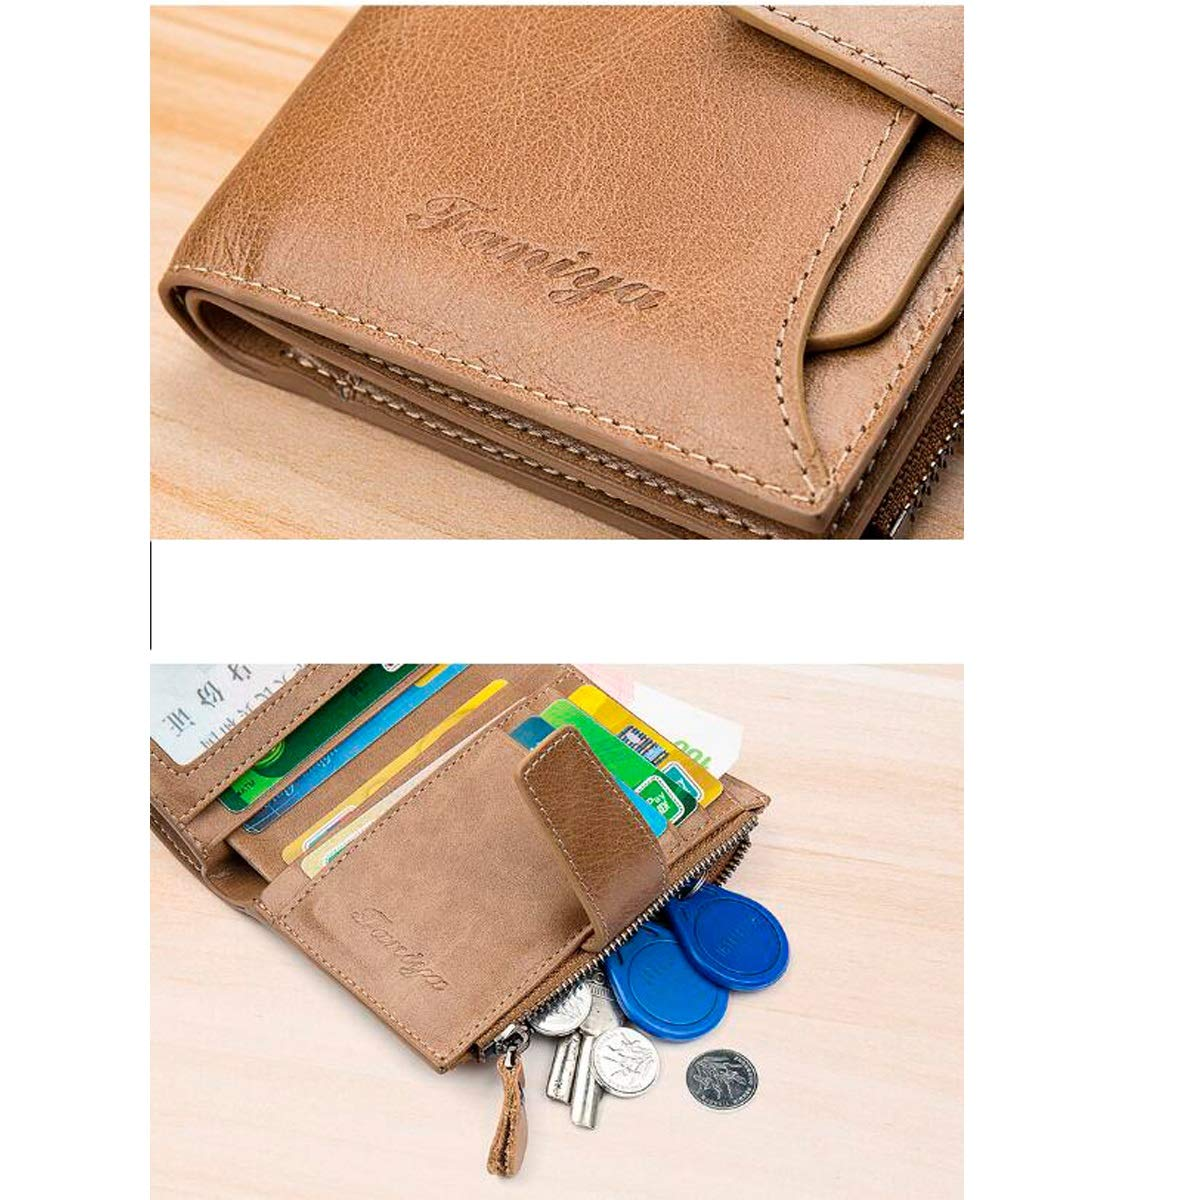 Kalmar RFID Travel Wallet 3 ID Window RFID Wallet Men Gift of Love Extra Capacity Travel Wallet Color : Brown Double Fold Flip Extra Capacity Travel Wallet